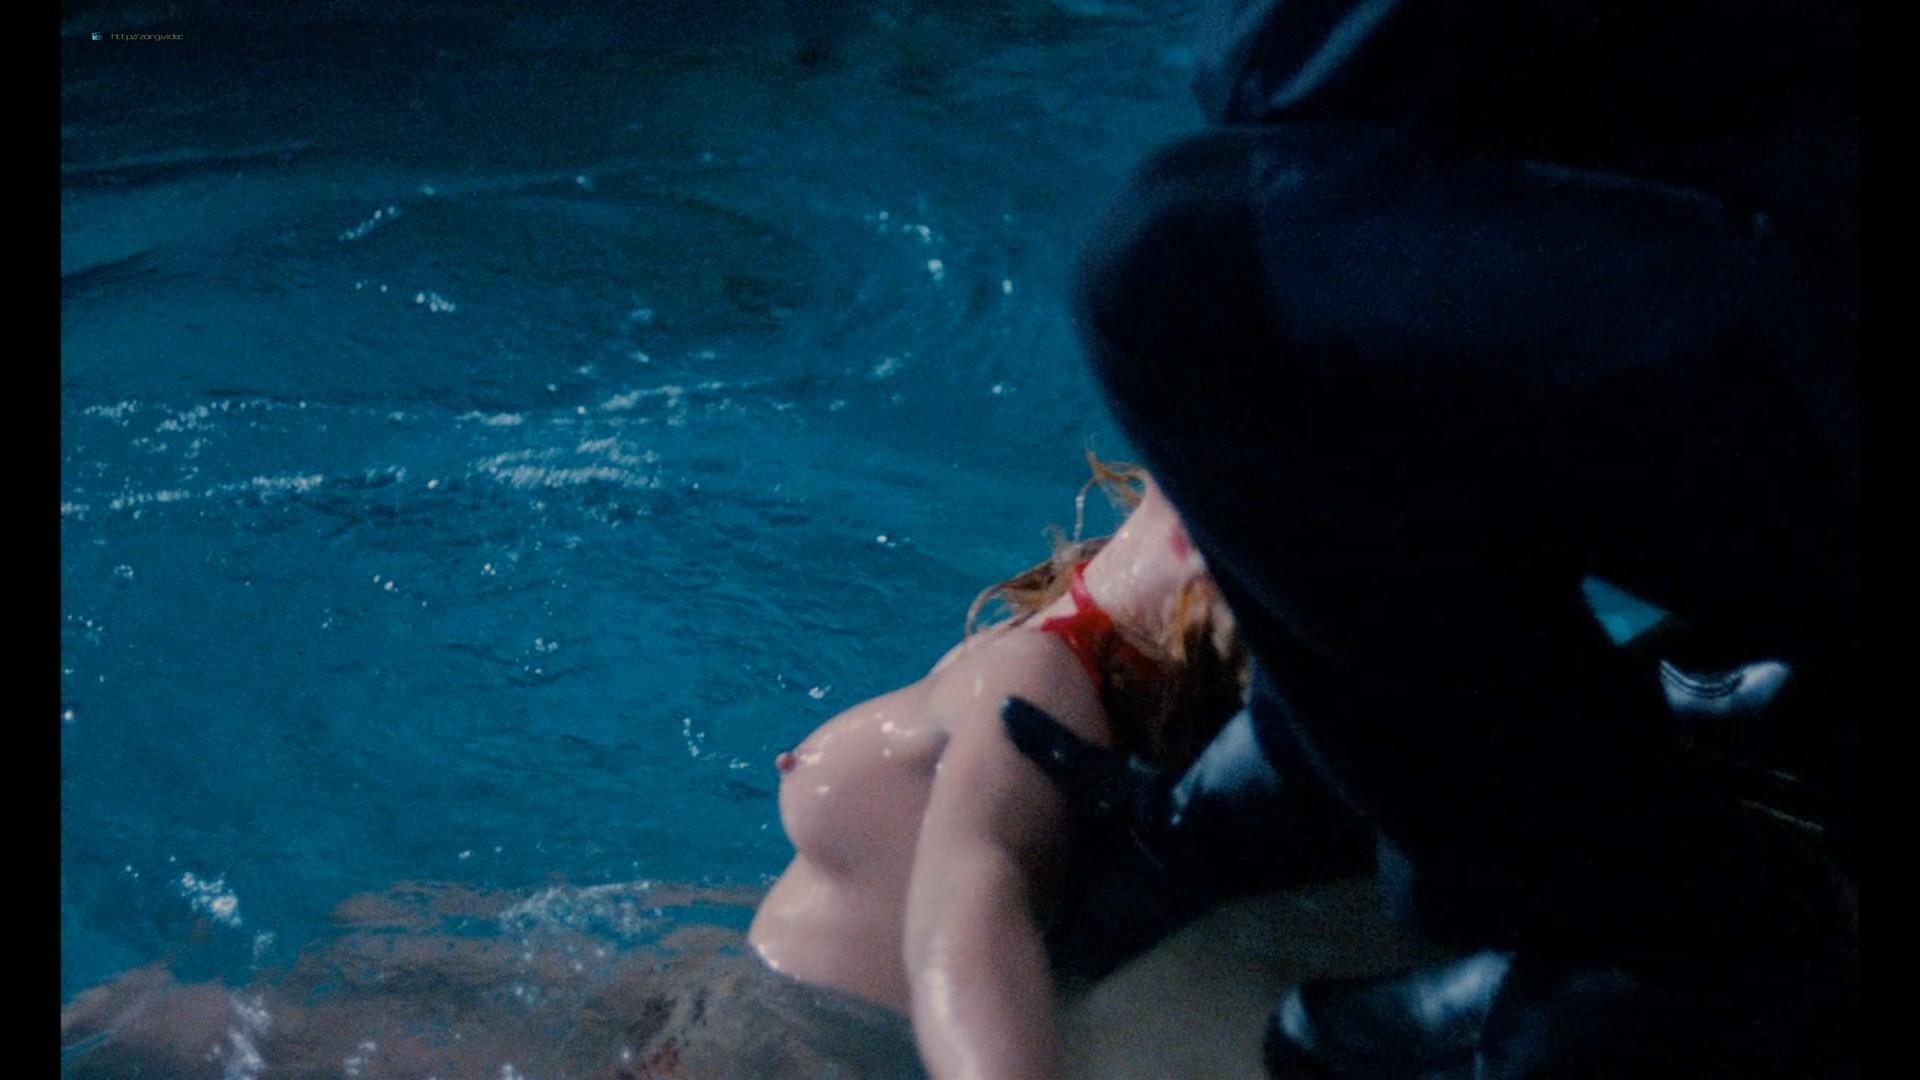 Roxana Nieto nude Leticia Marfil and Pilar Alcón all nude bush topless - Pieces (1982) HD 1080p BluRay (18)